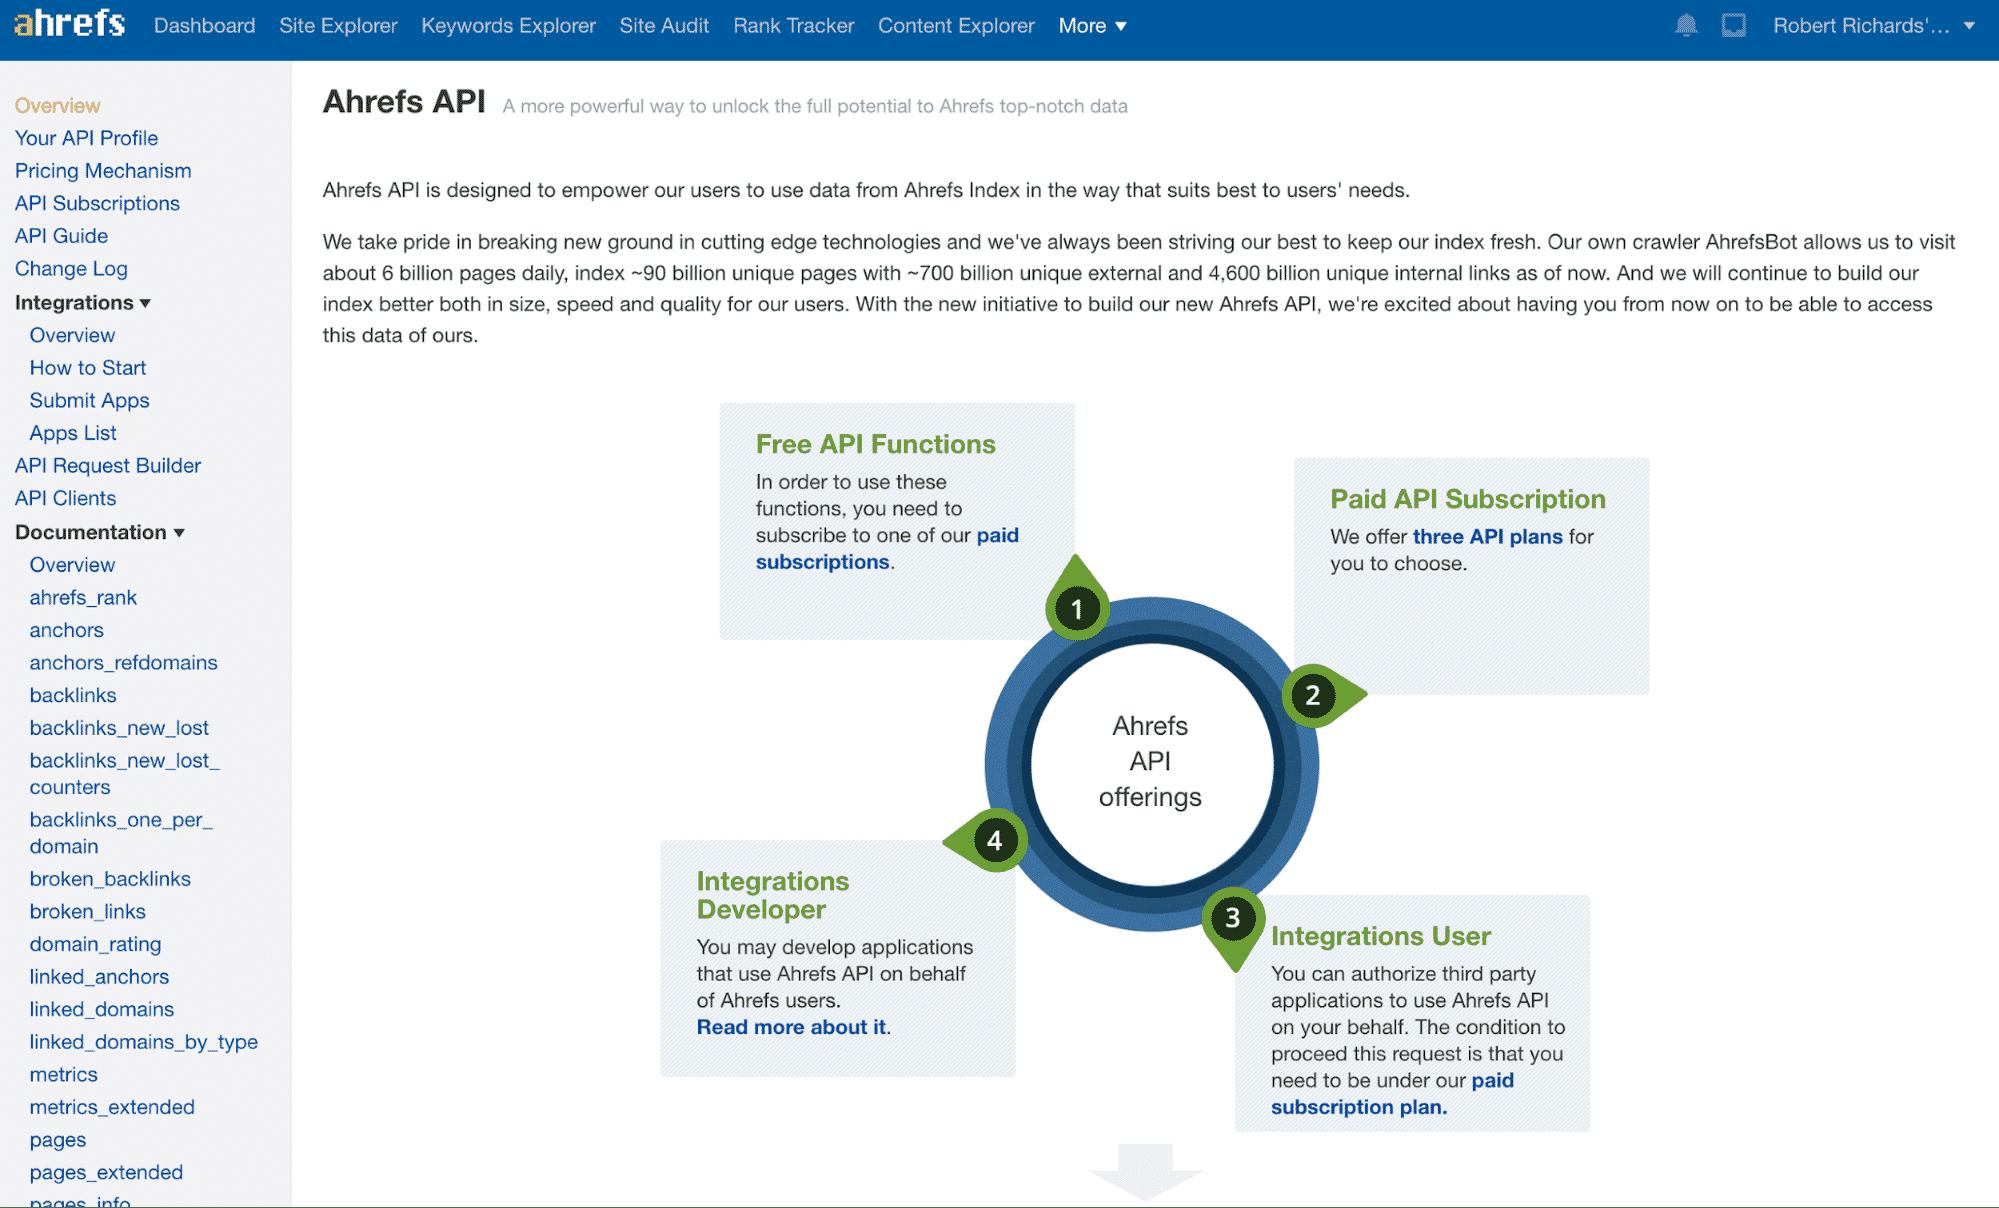 Ahrefs API options